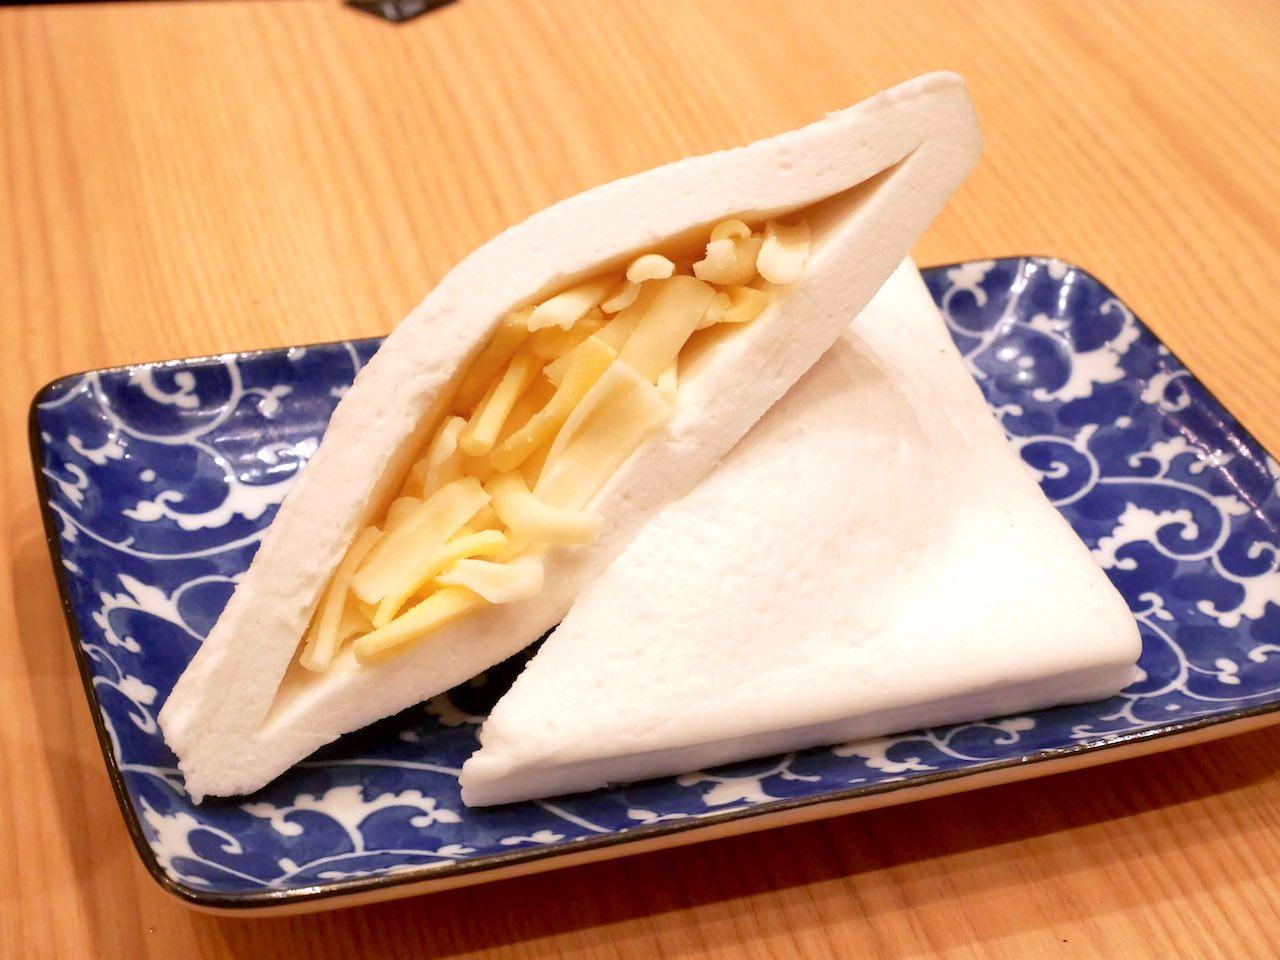 http://dinner.tokyo-review.com/images/1090474.jpg